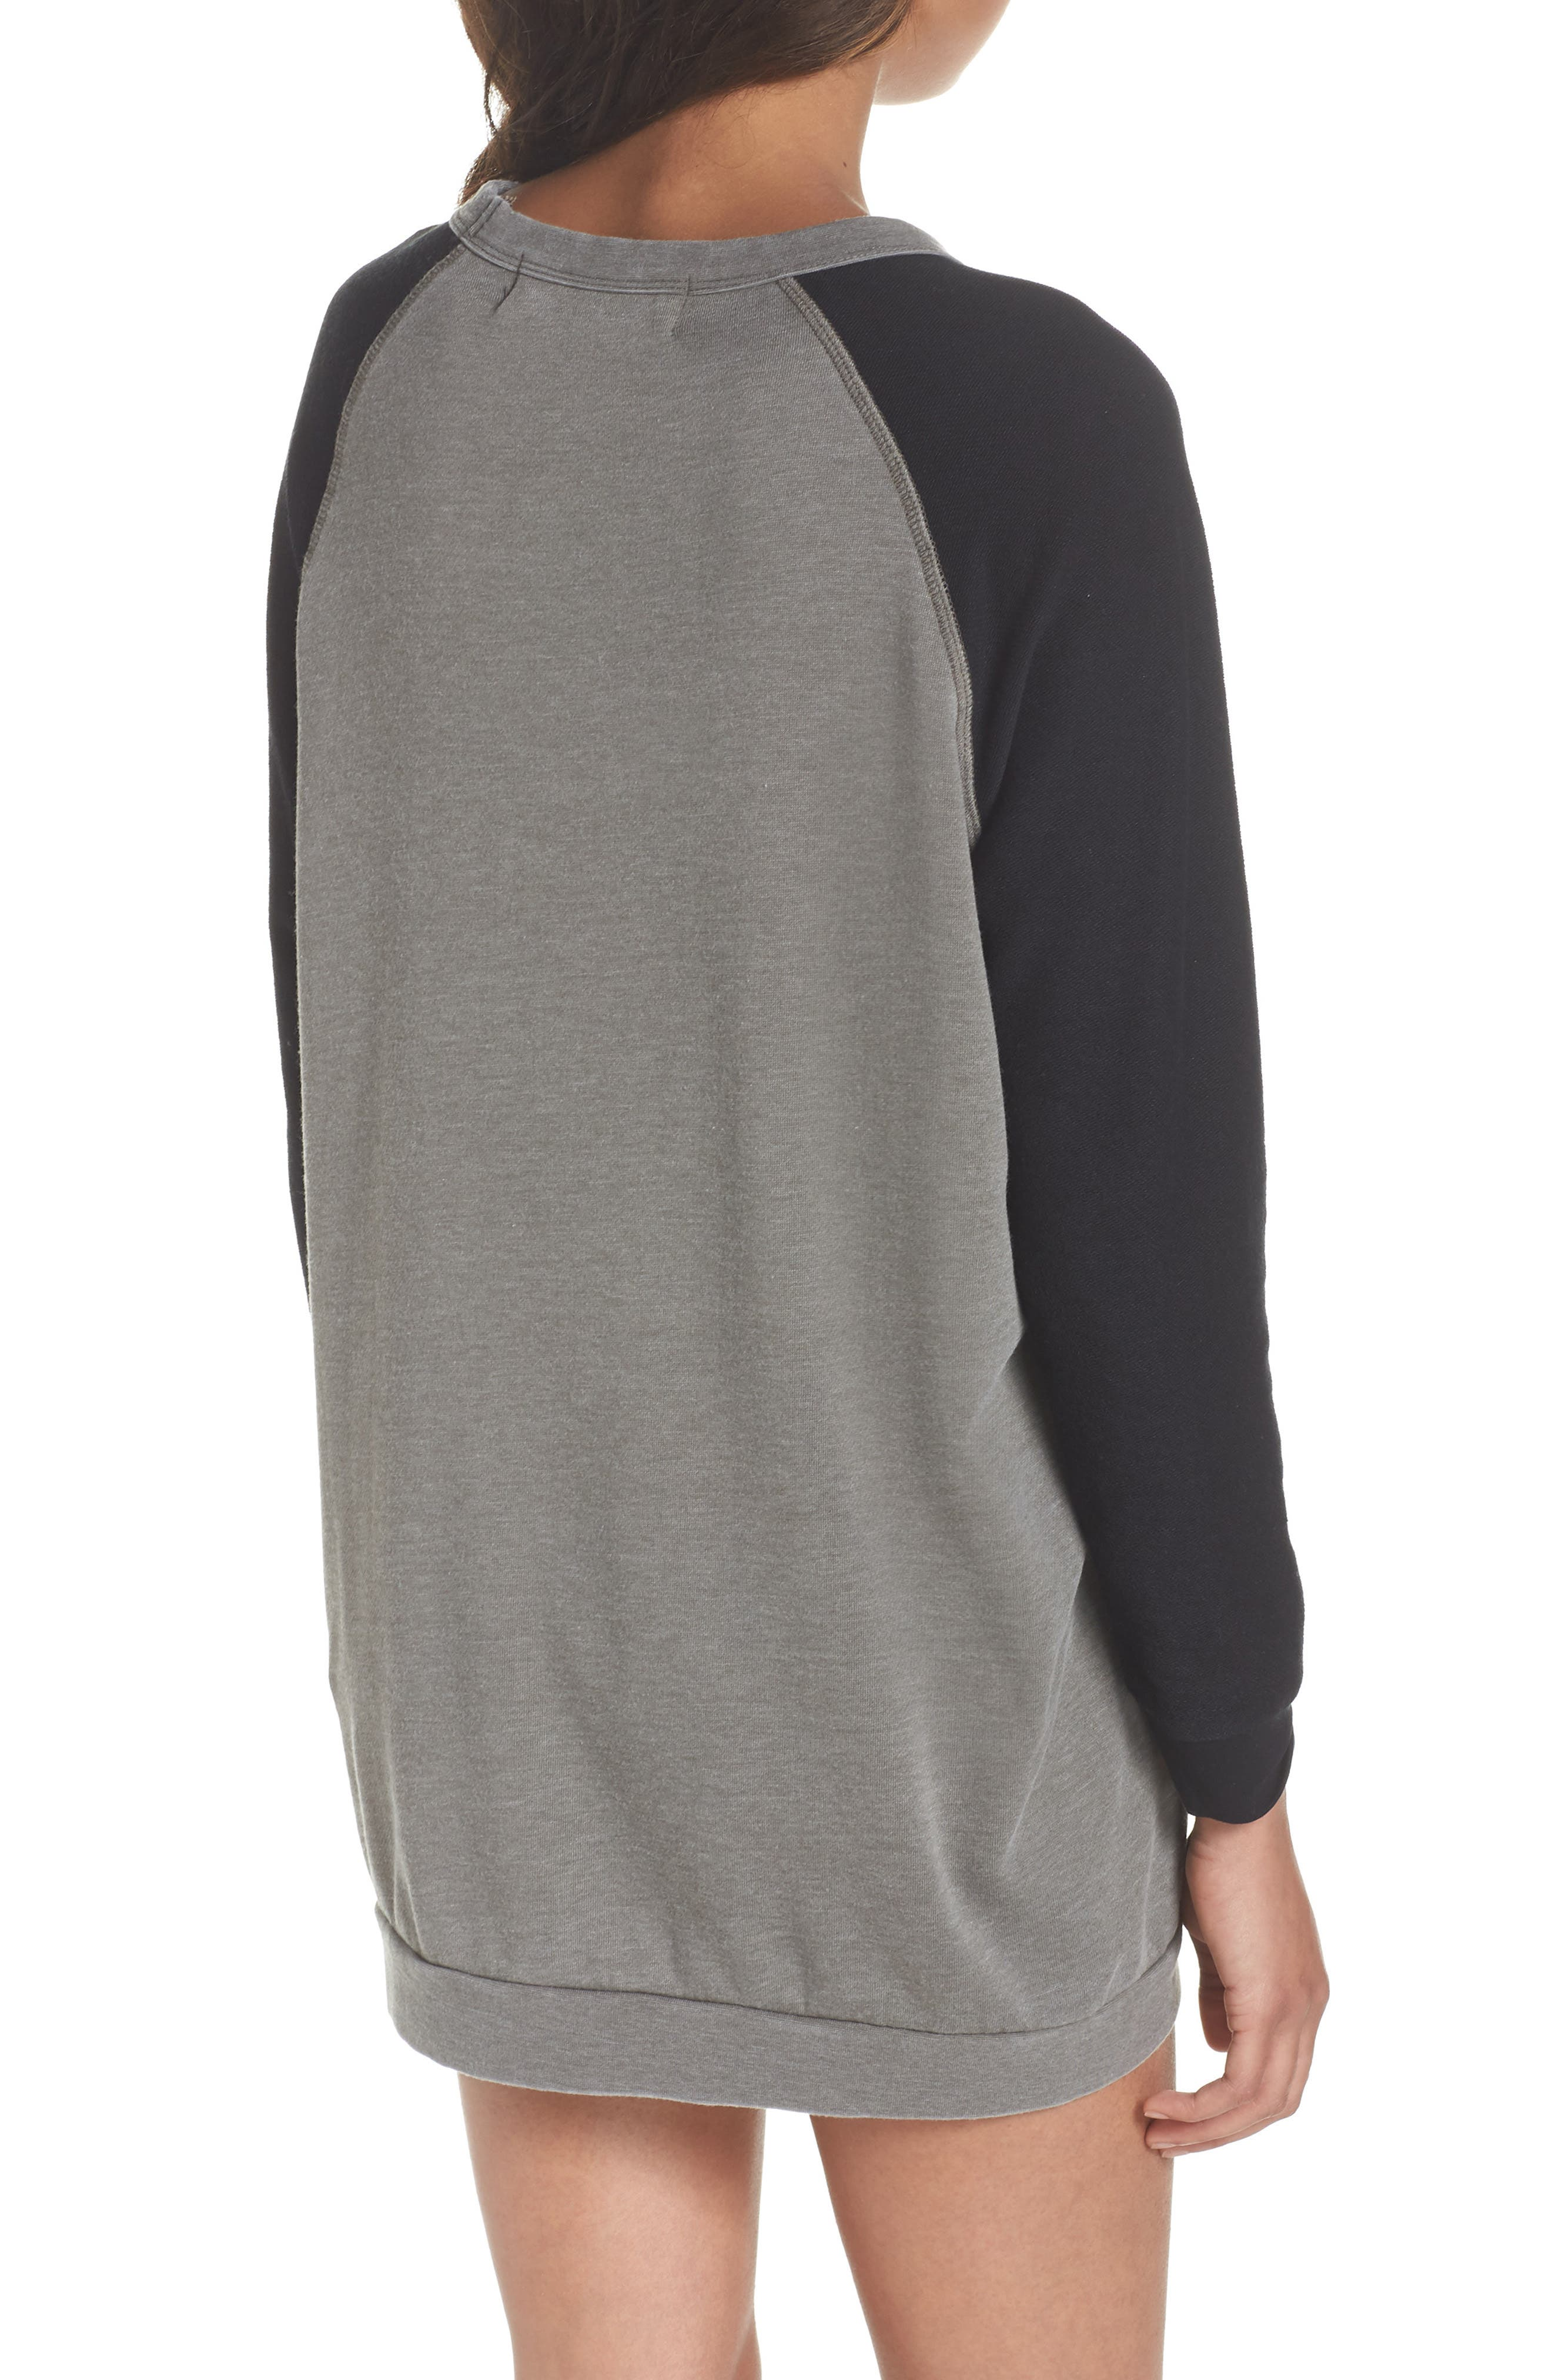 Lounge Sweatshirt Dress,                             Alternate thumbnail 2, color,                             001